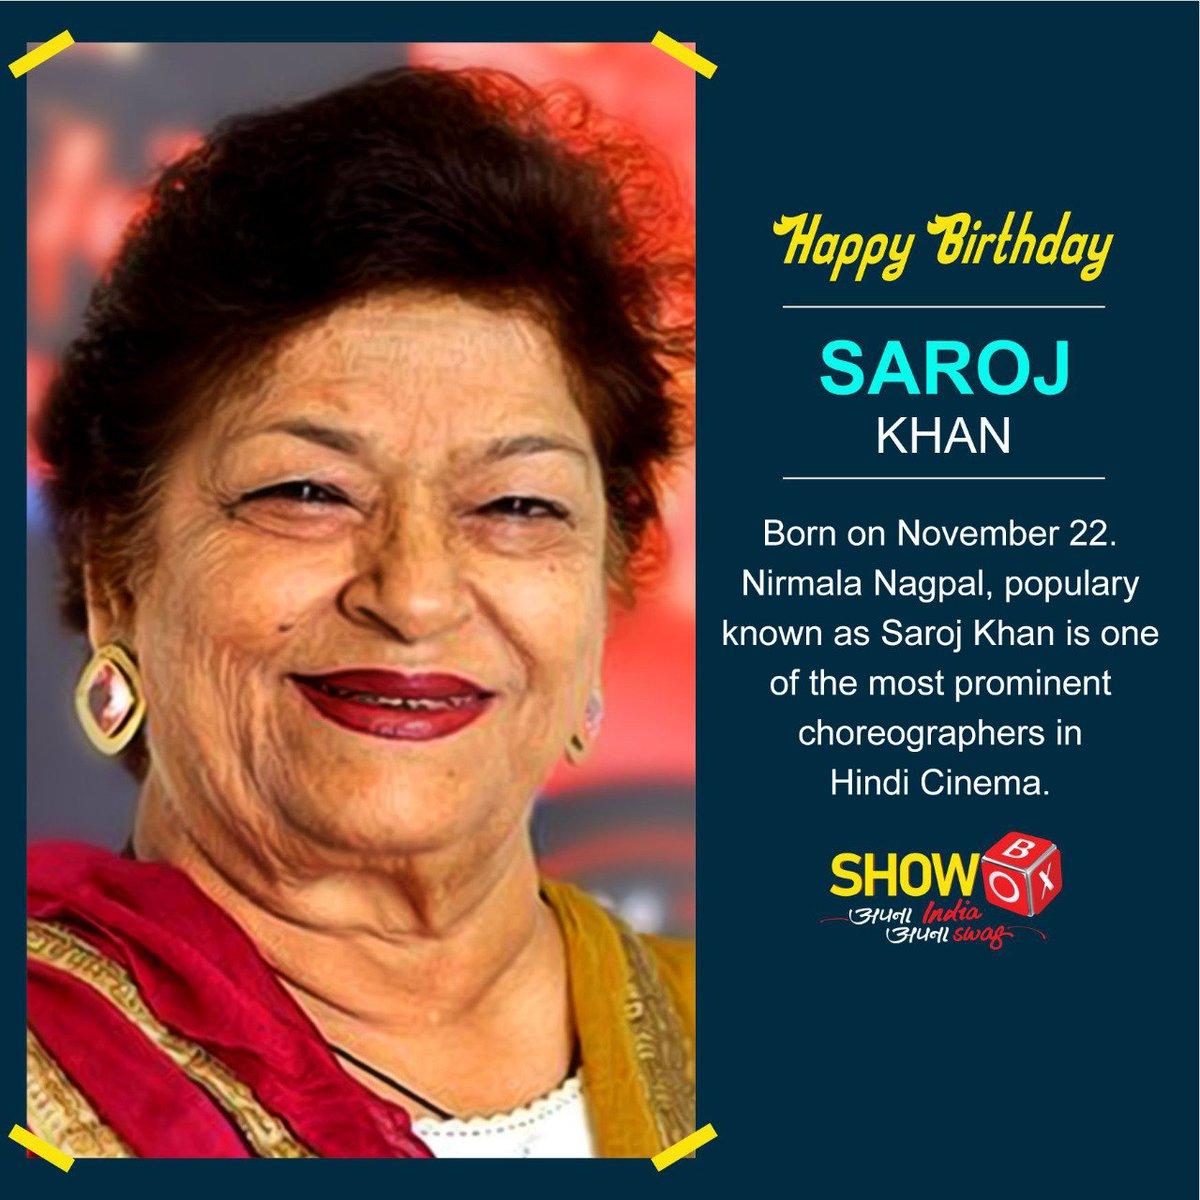 ShowBox wishes a very happy birthday to the real dance guru of Bollywood.  #HappyBirthdaySarojKhan #SarojKhan #DanceGuru #IndianChoreographer pic.twitter.com/JaT0P4H5hT